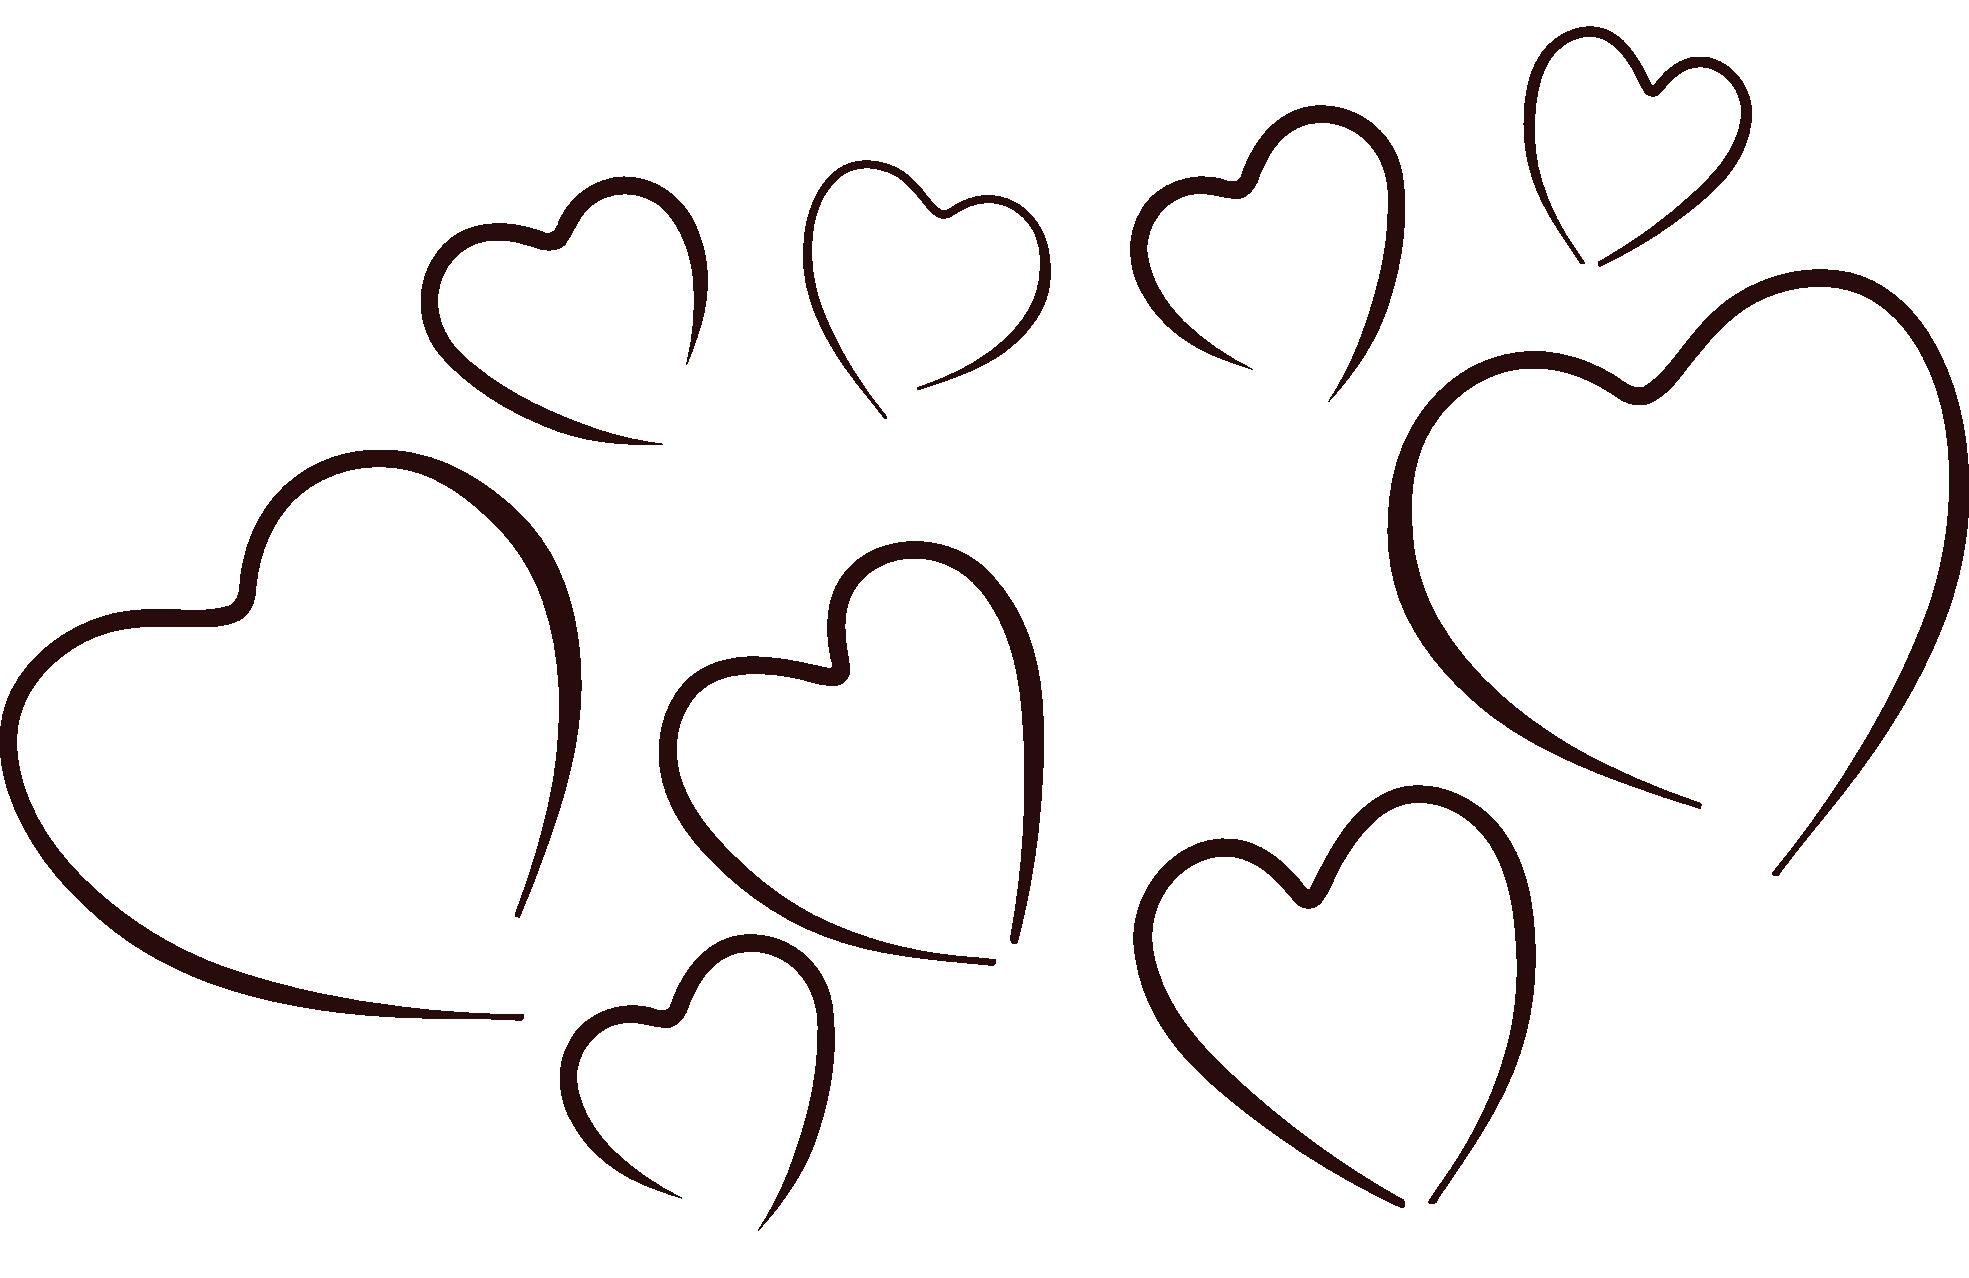 Heart Black And White Row Of Hearts Clip-Heart black and white row of hearts clipart black and white-10